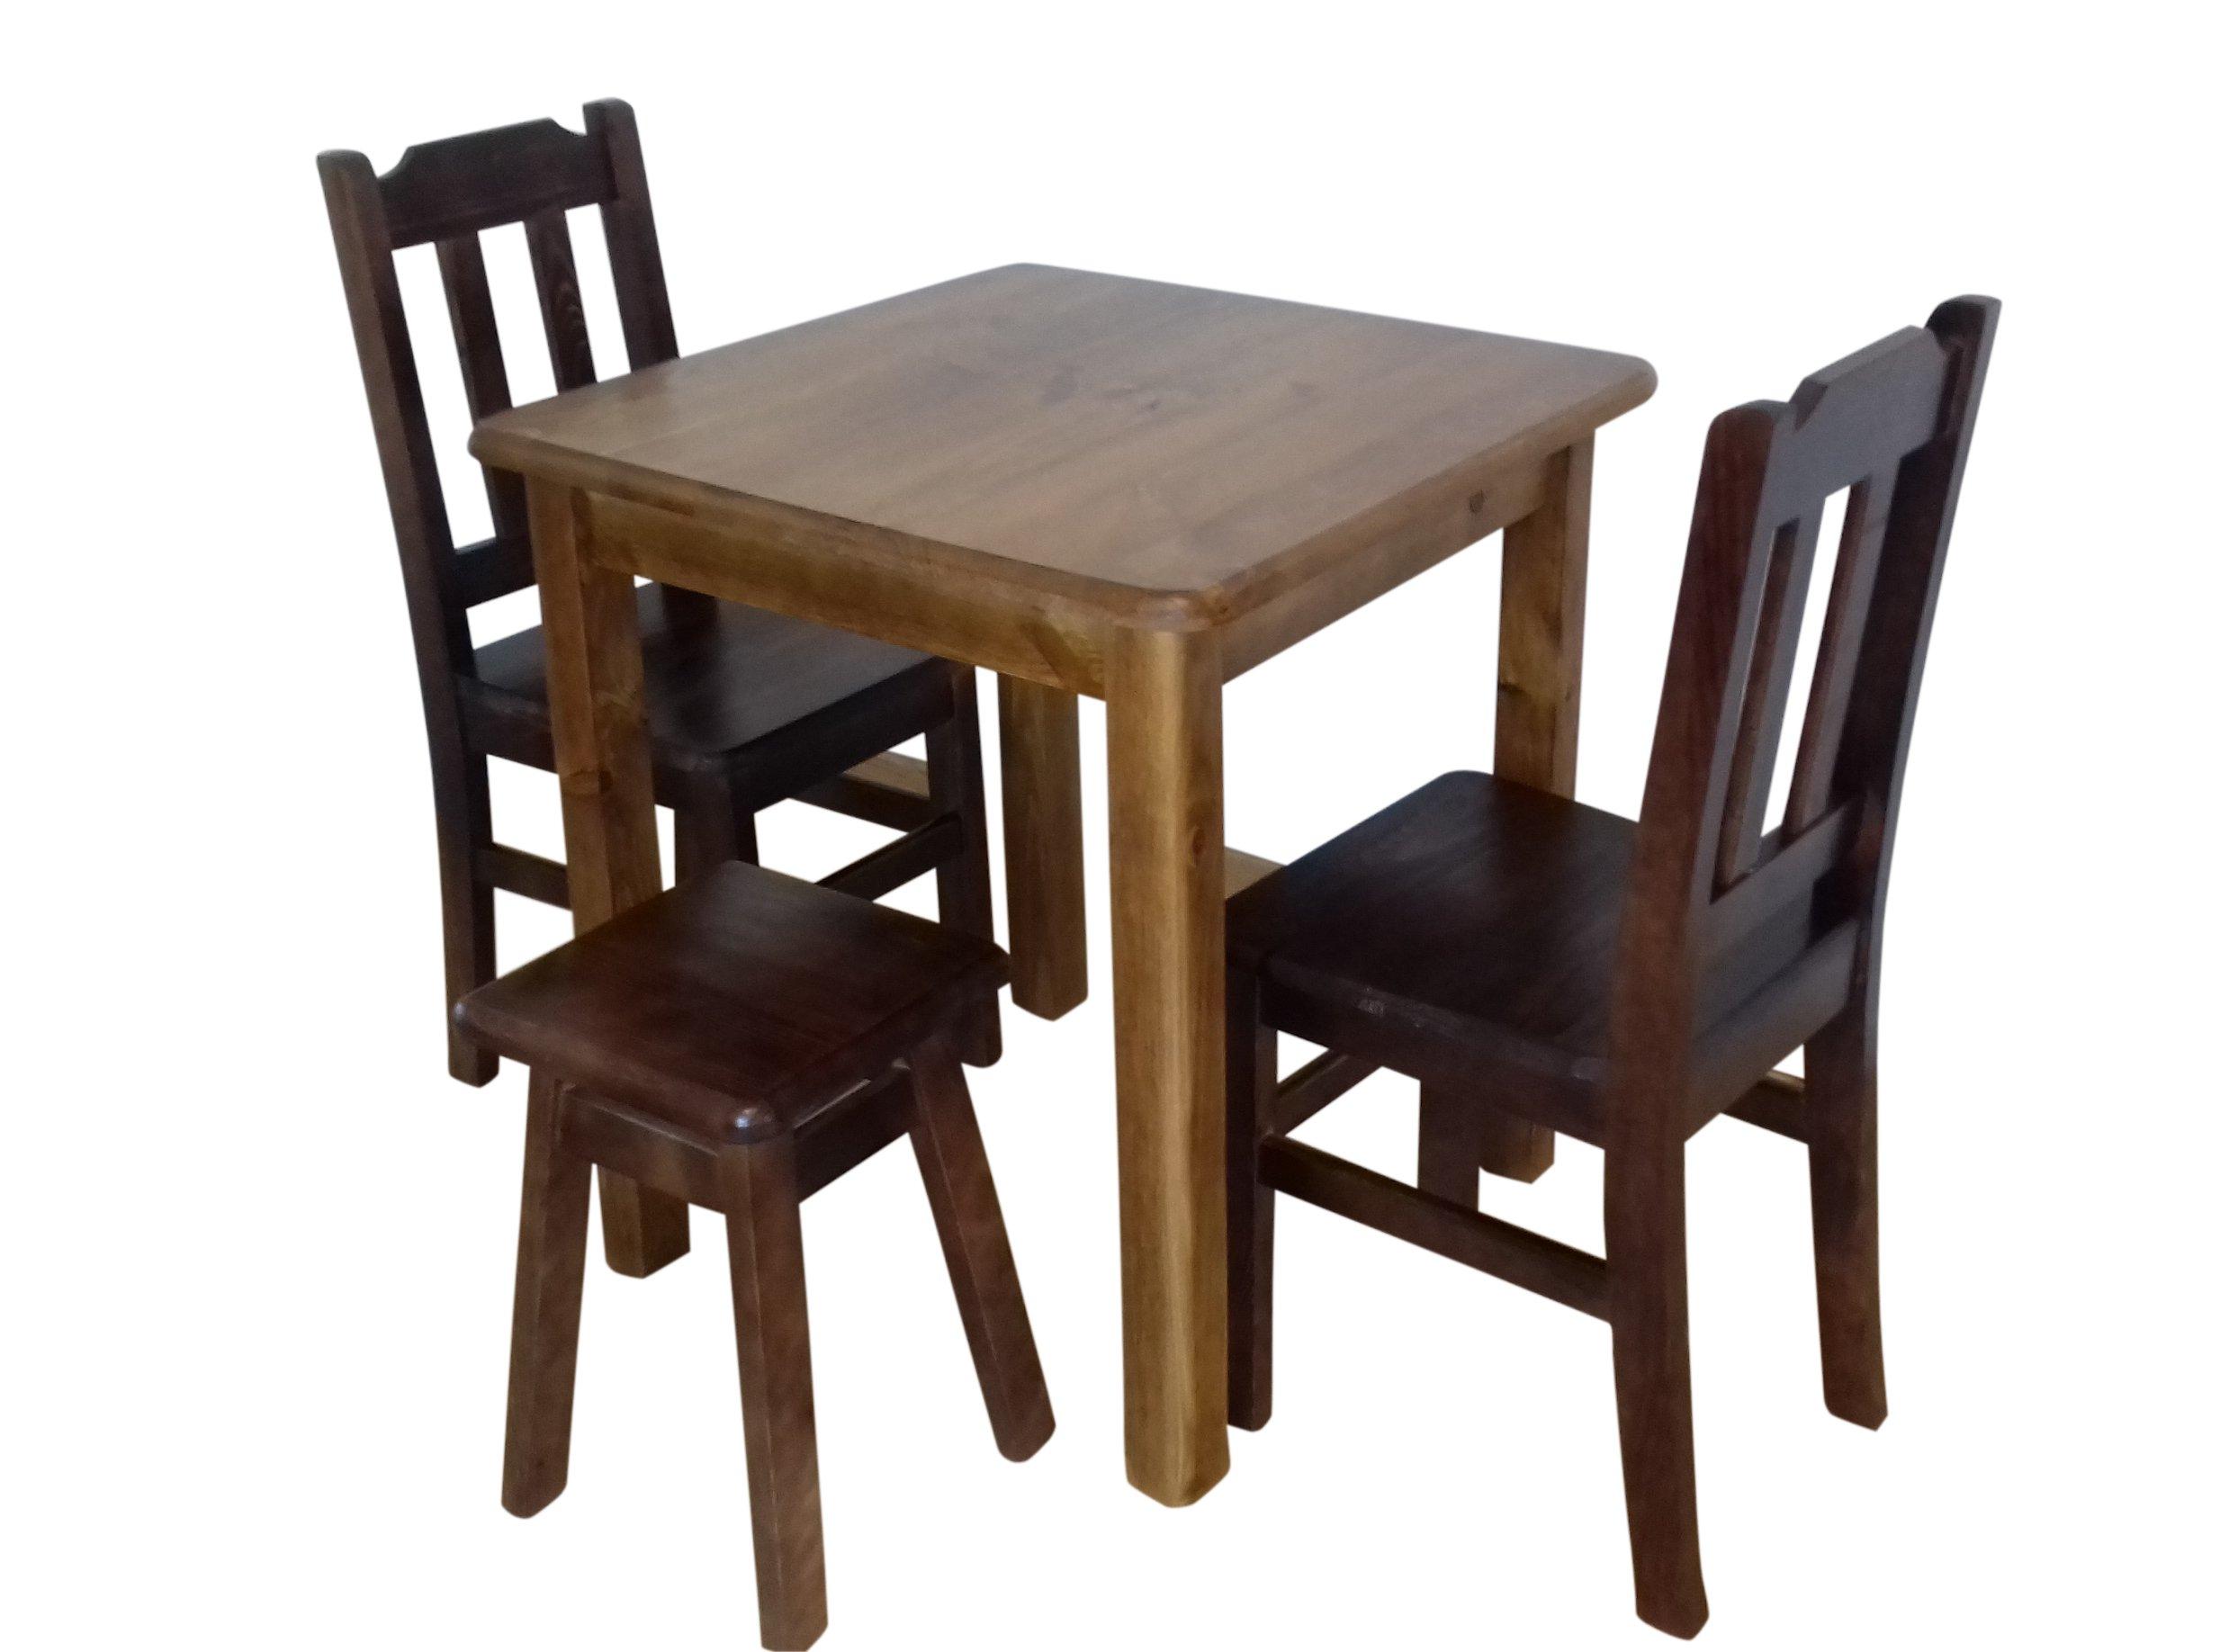 MASÍVNE kuchynský stôl 75x75 kuchyňa, jedáleň, bar